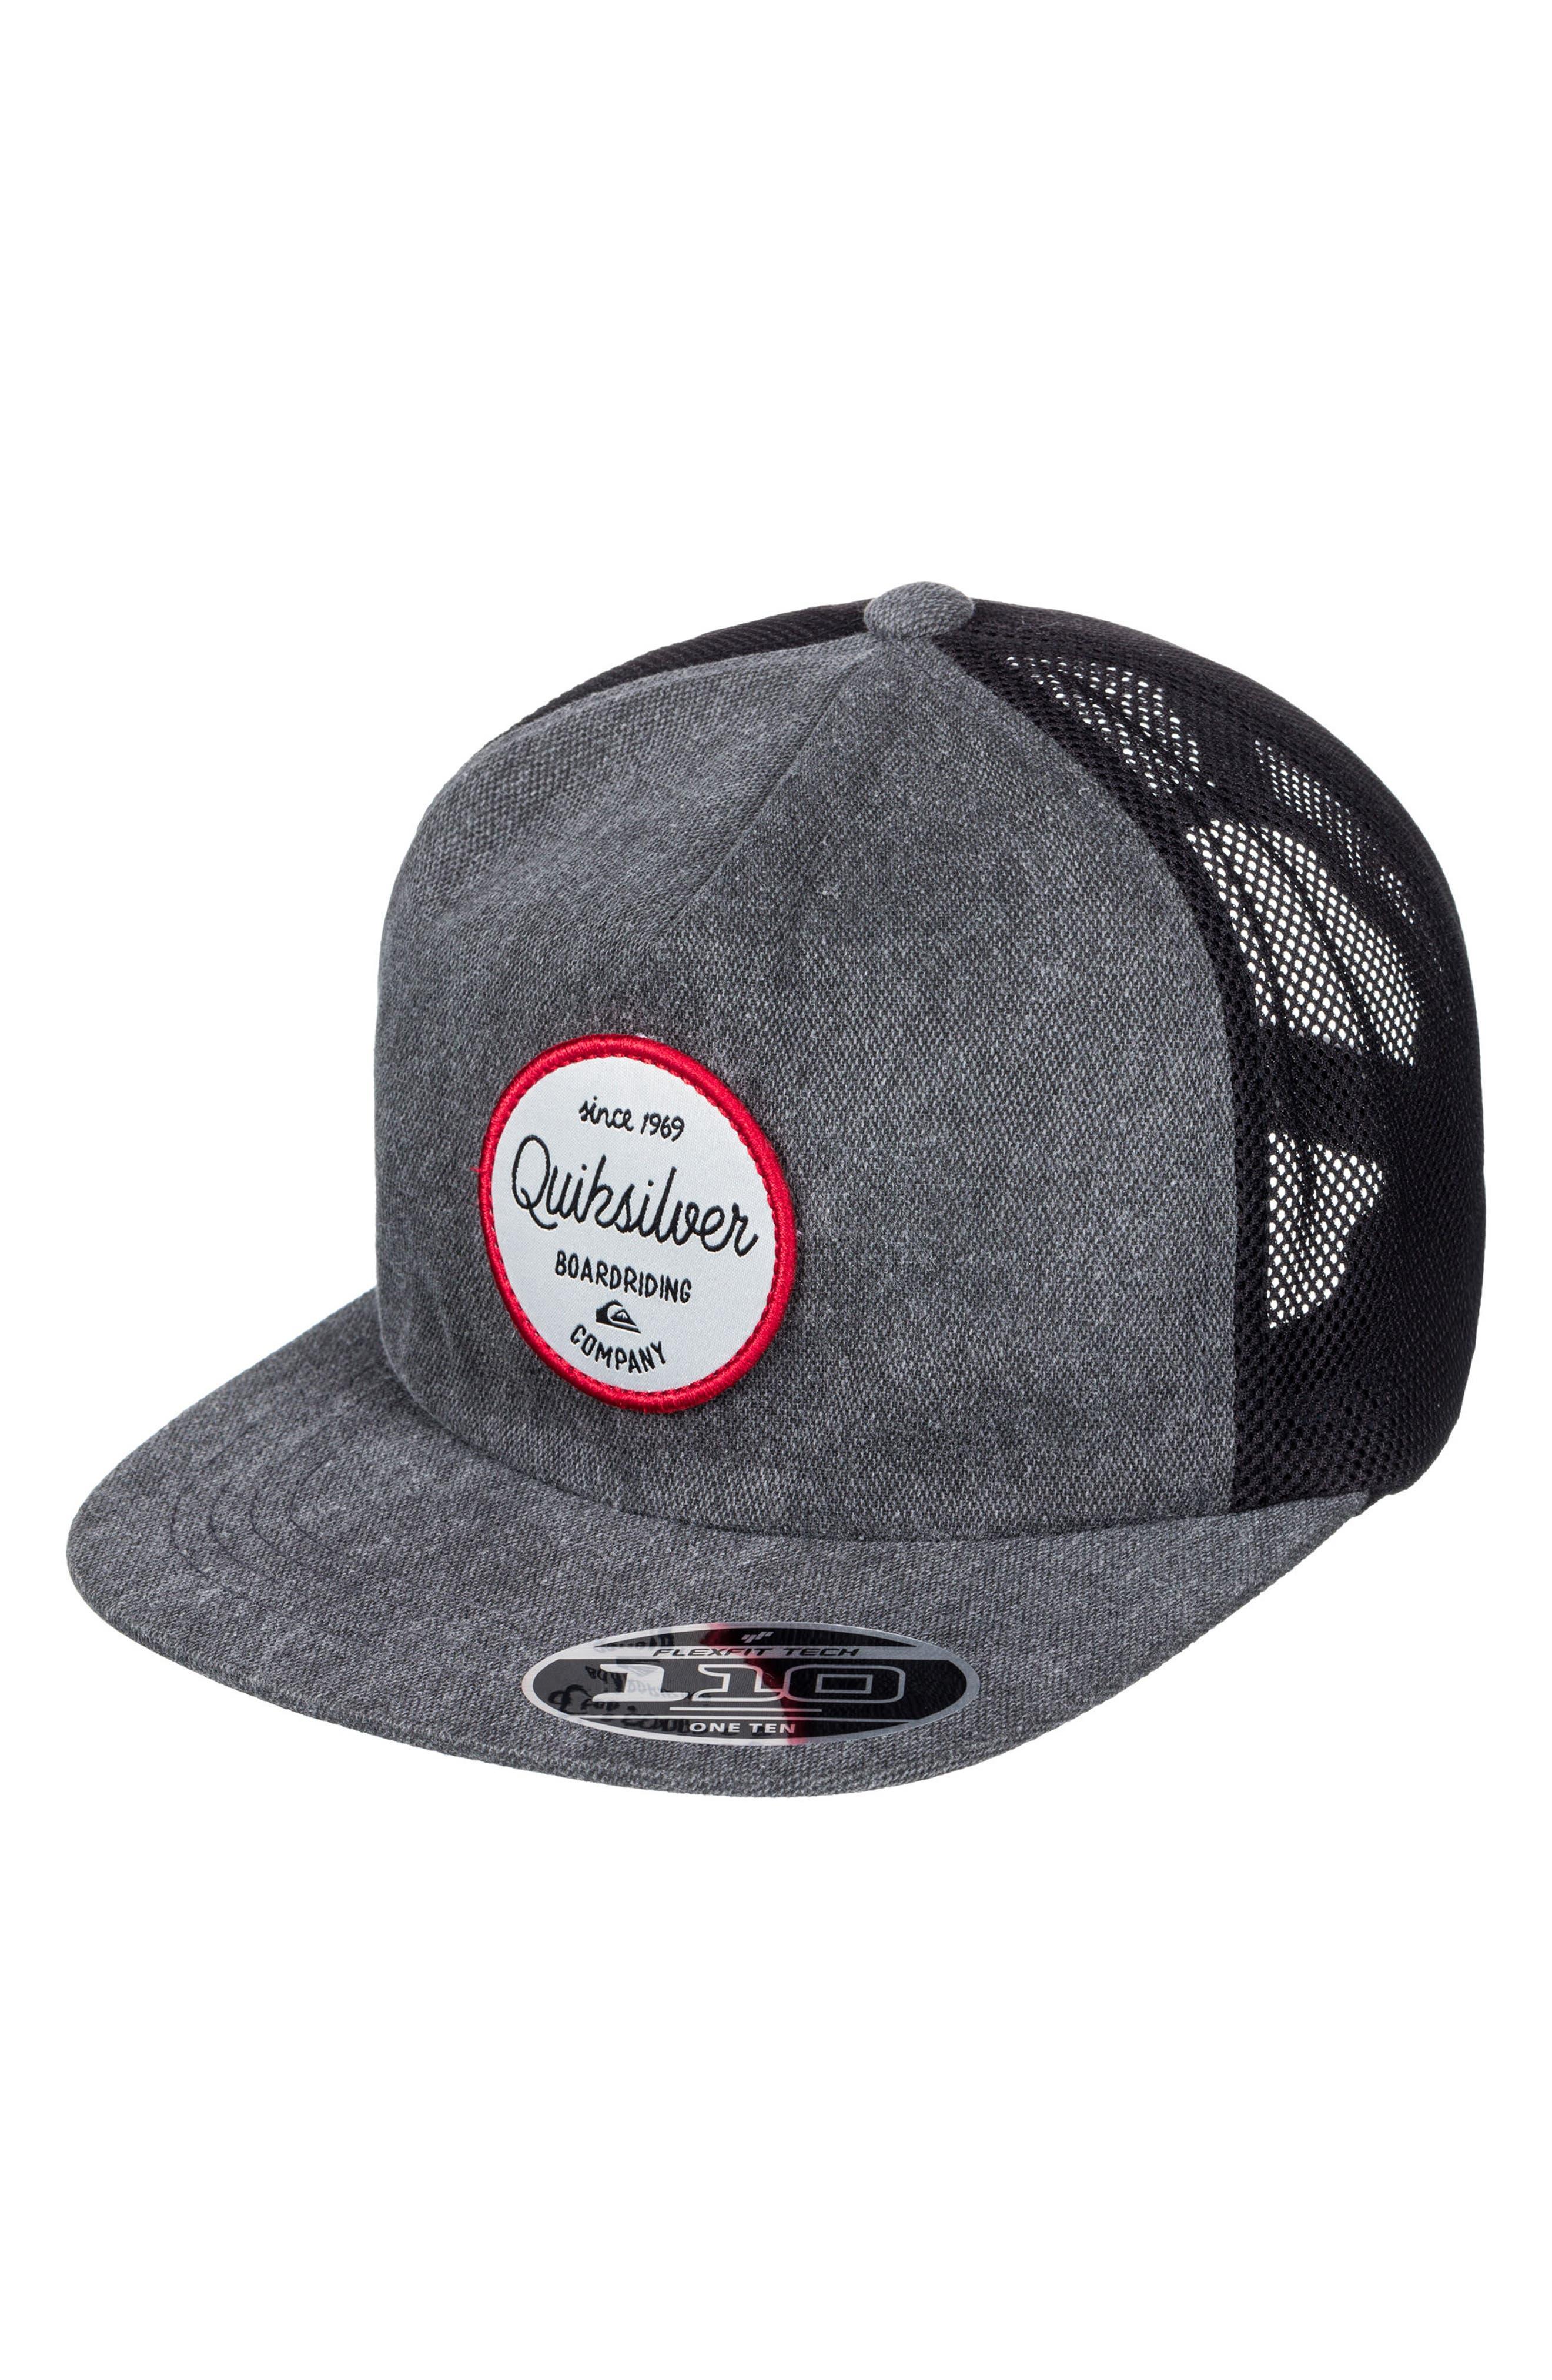 Sloucher Trucker Hat,                             Main thumbnail 1, color,                             002